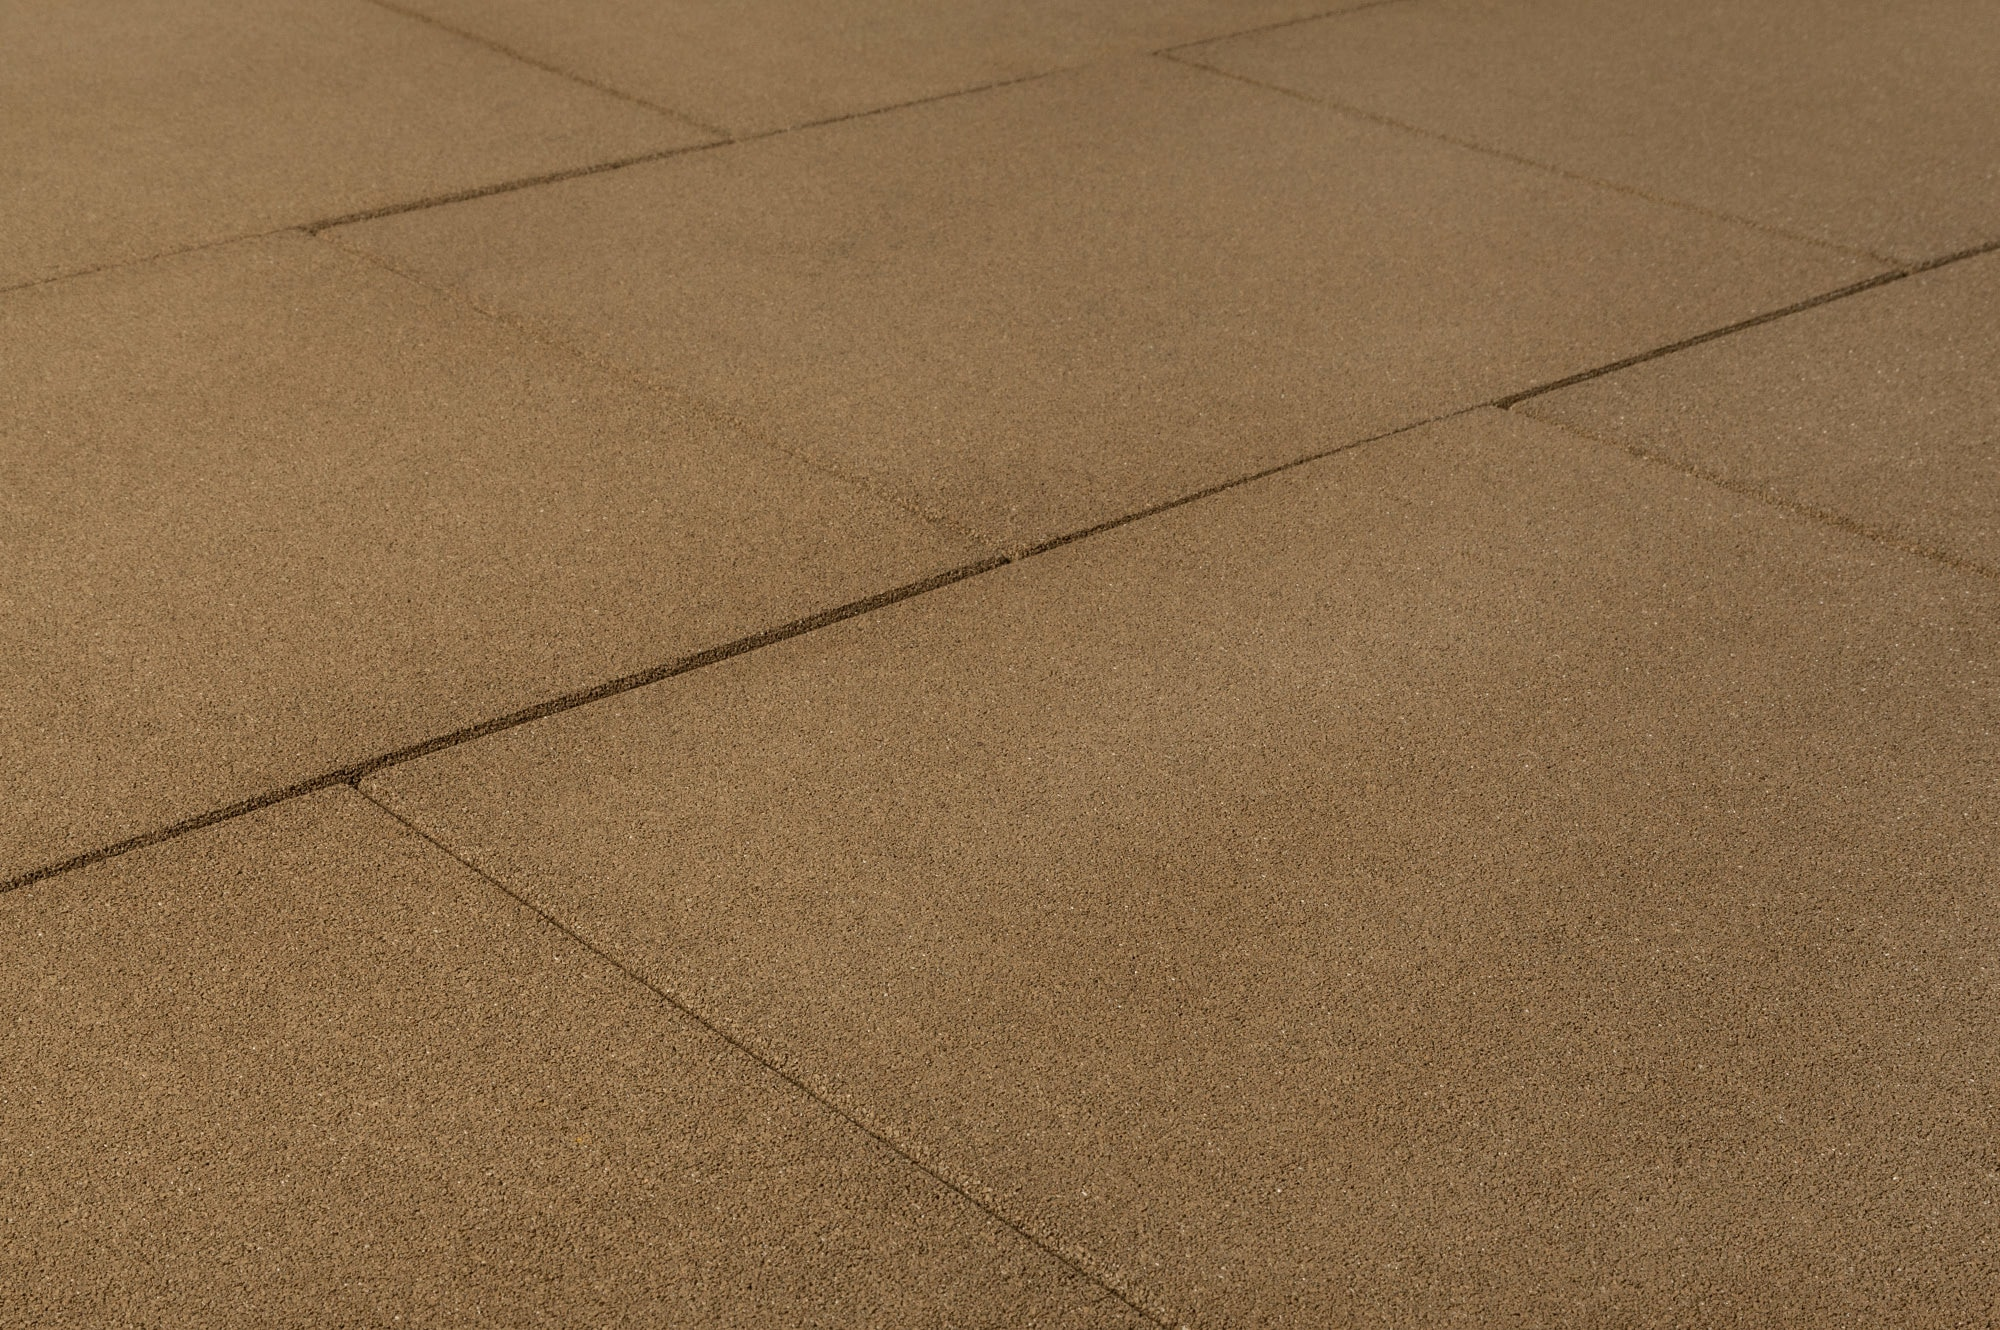 Brava Outdoor Prestige Rubber Tiles Pigment Stone Beige 24